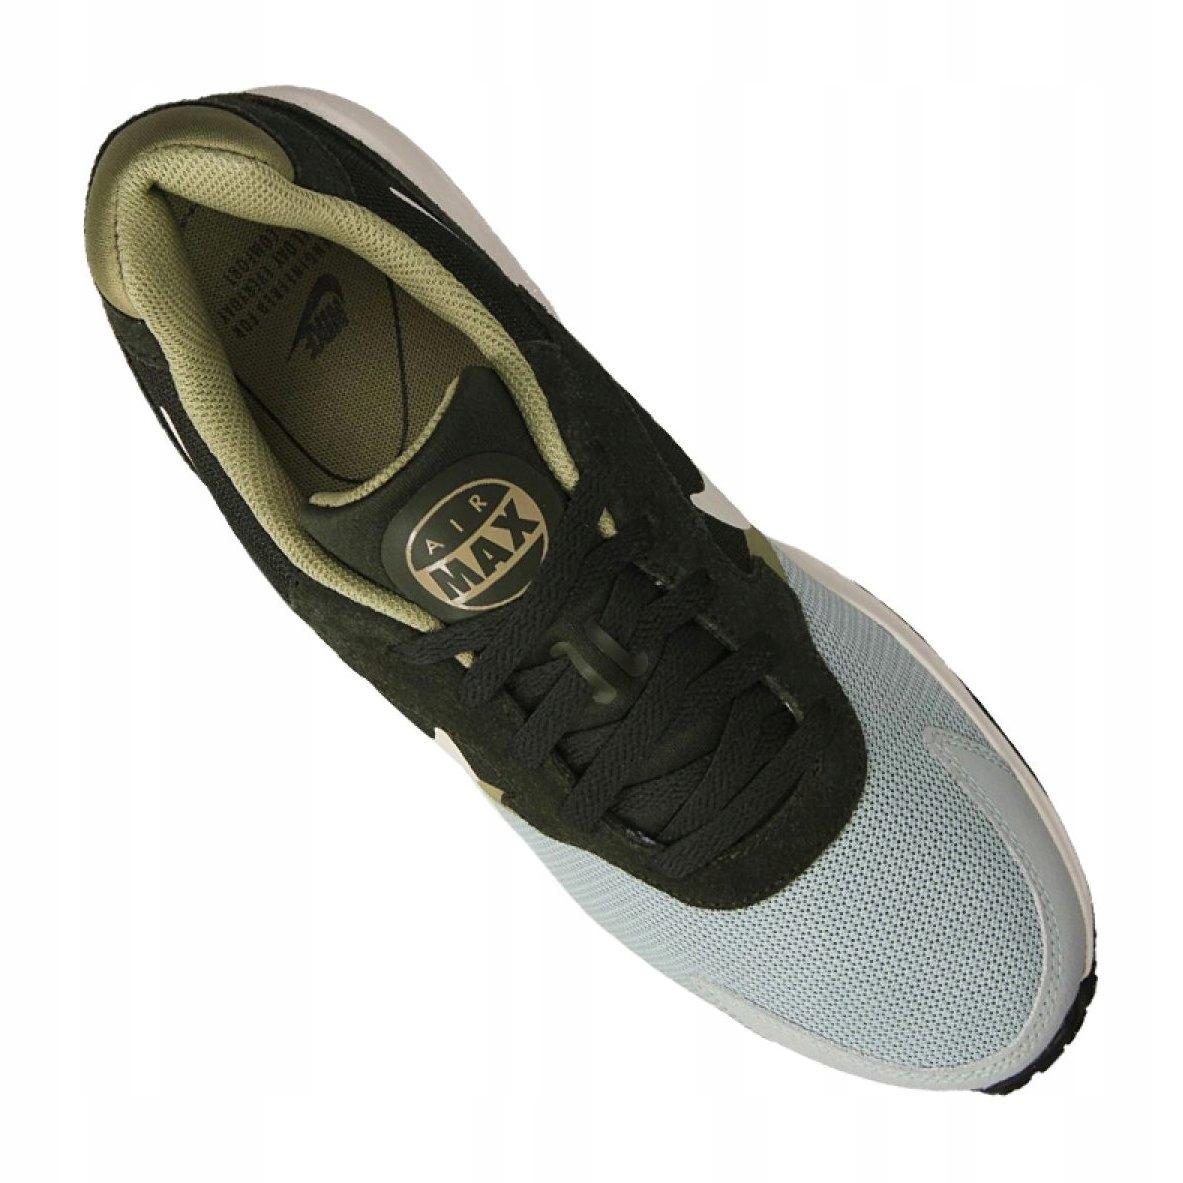 Buty Nike Air Max Guile M 916768 008 ButyModne.pl